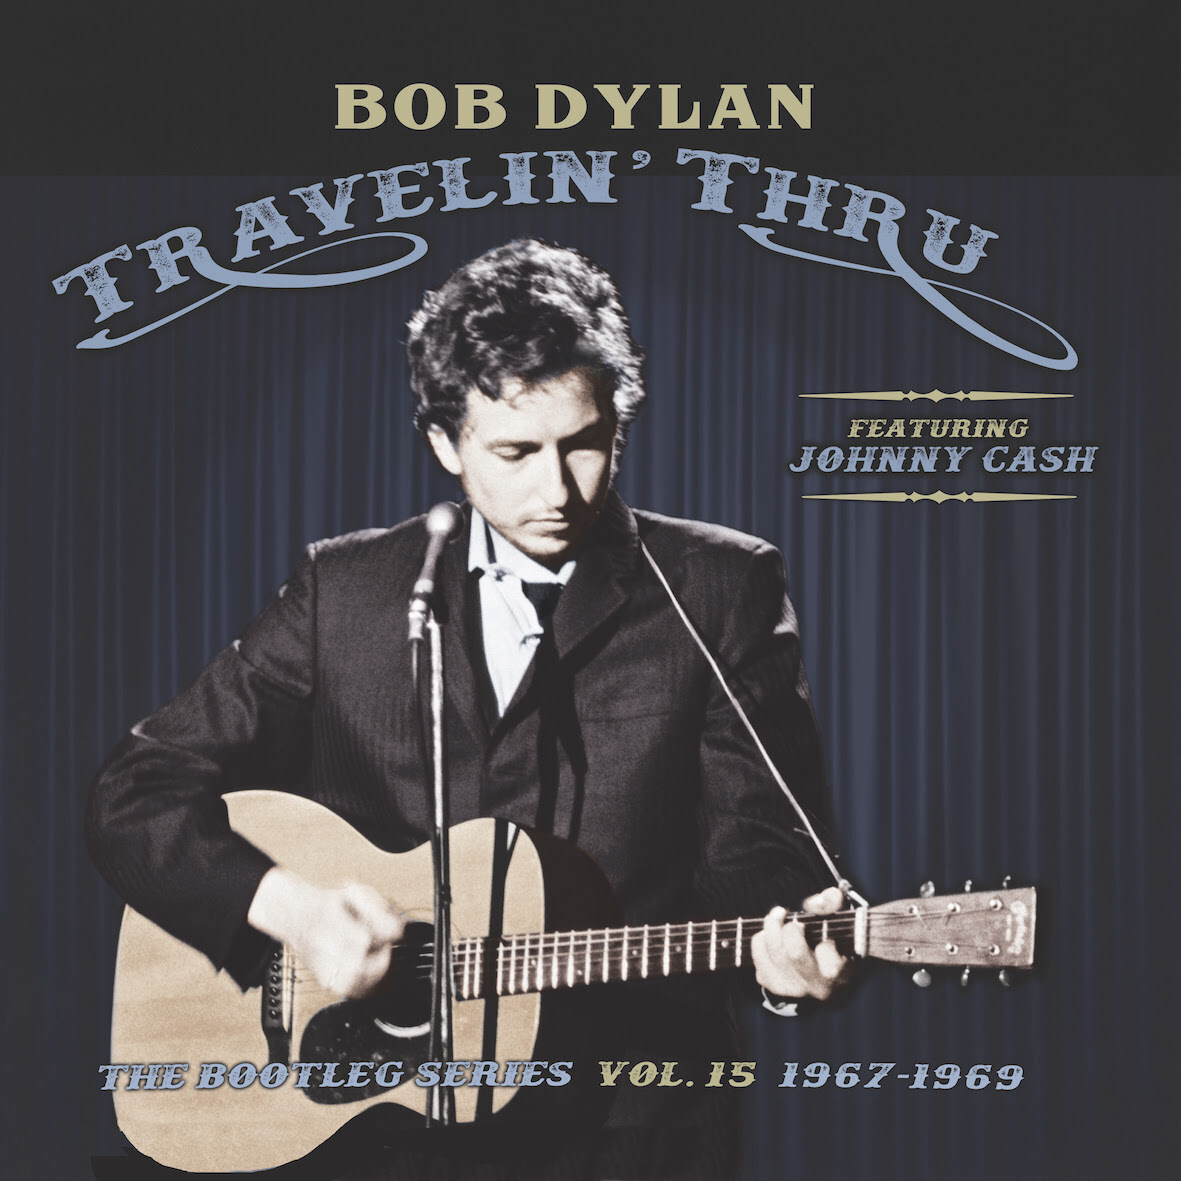 Bob Dylan Johnny Cash Travelin Thru 1967 69 Bootleg Series 15